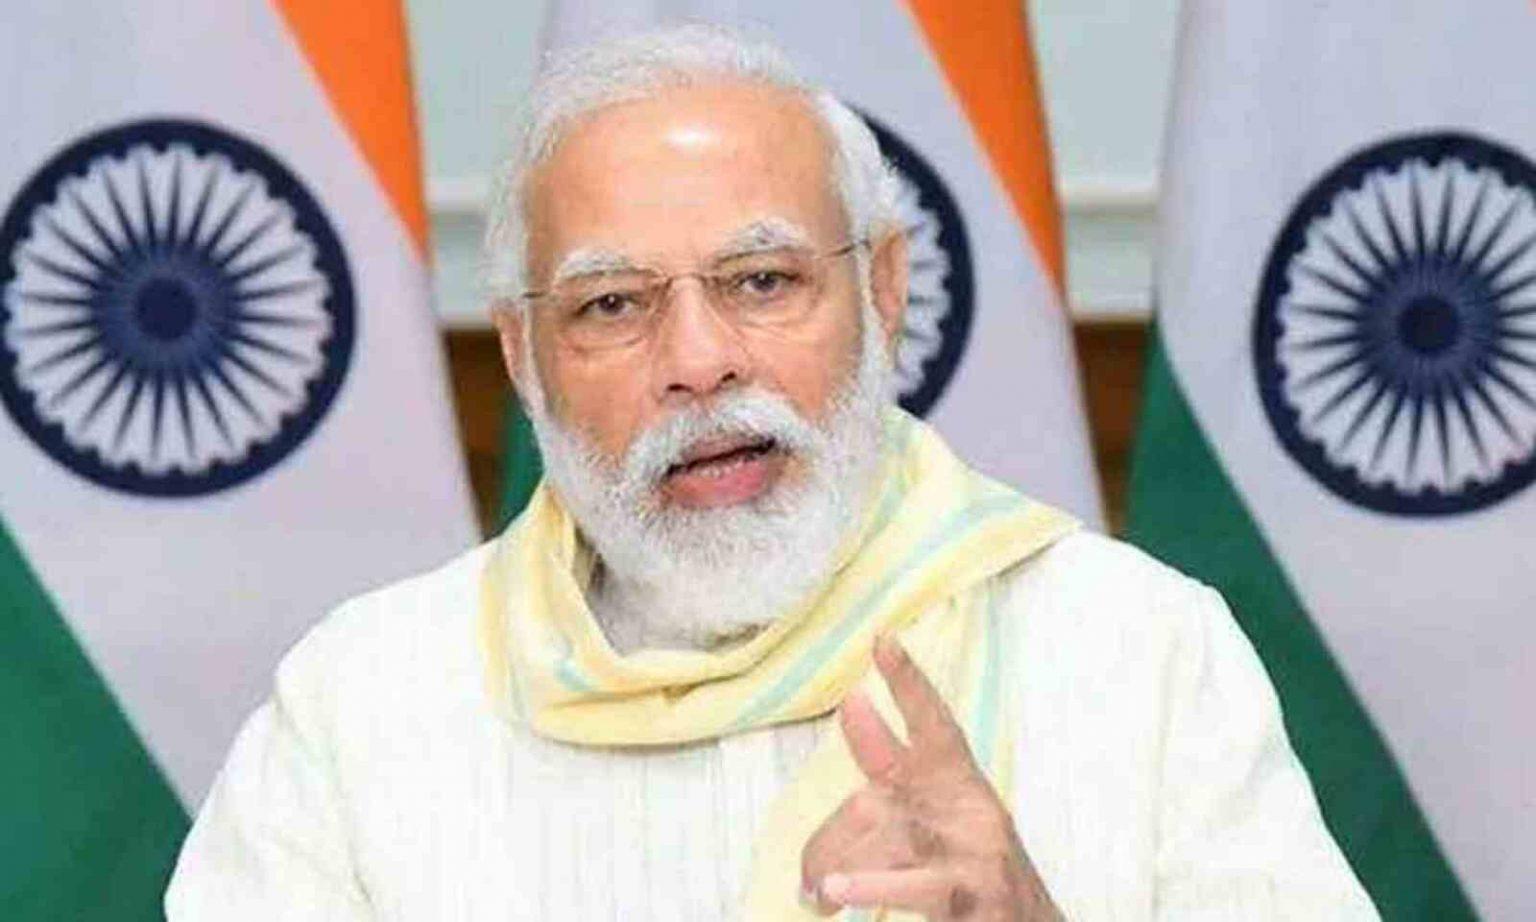 6th anniversary of Skill India Mission addressed by PM Modi|പ്രധാനമന്ത്രി മോദി അഭിസംബോധന ചെയ്ത സ്കിൽ ഇന്ത്യ മിഷന്റെ ആറാം വാർഷികം_40.1